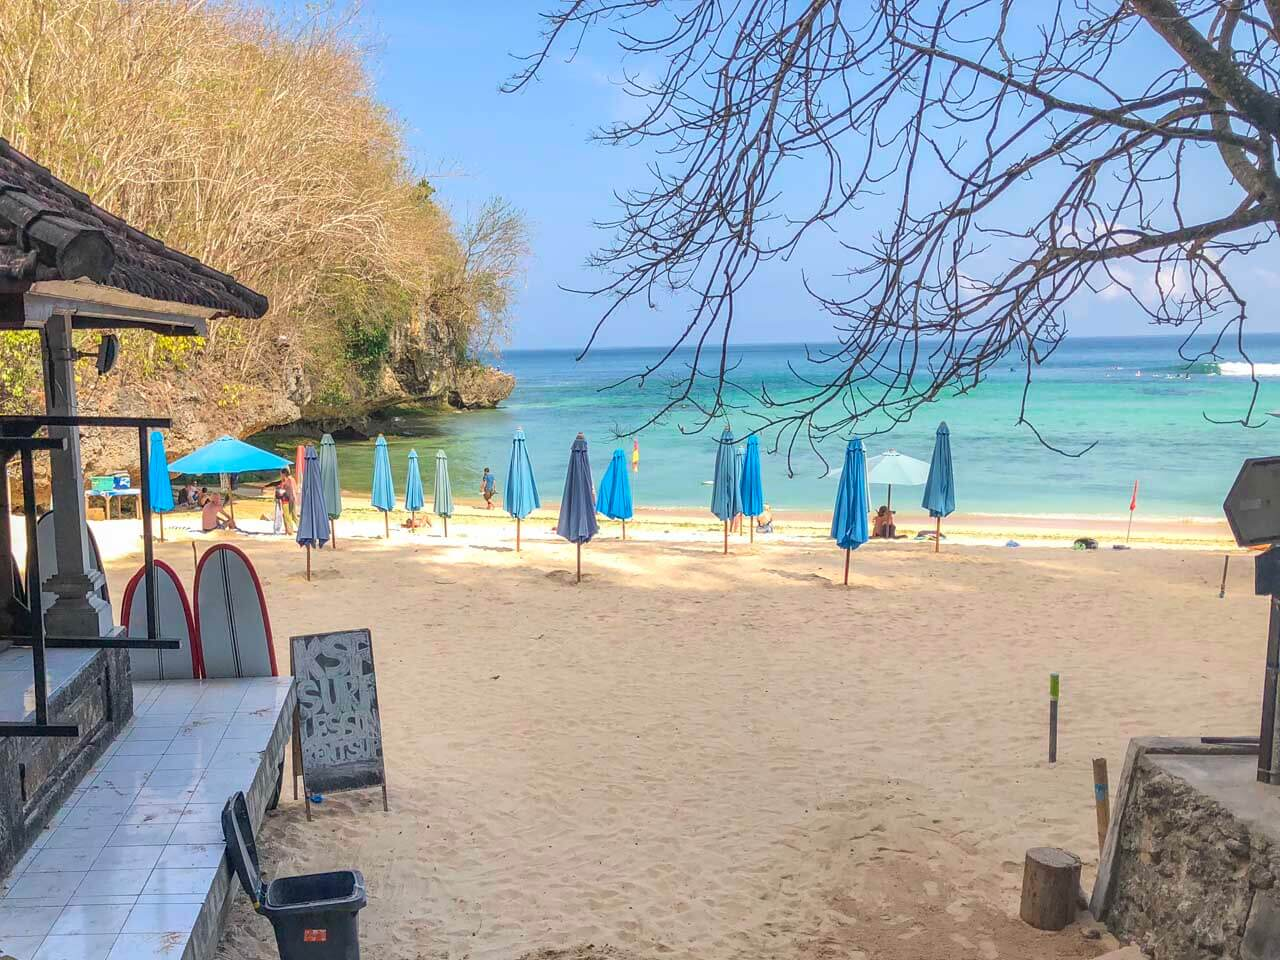 Barracas em Padand Padang Beach